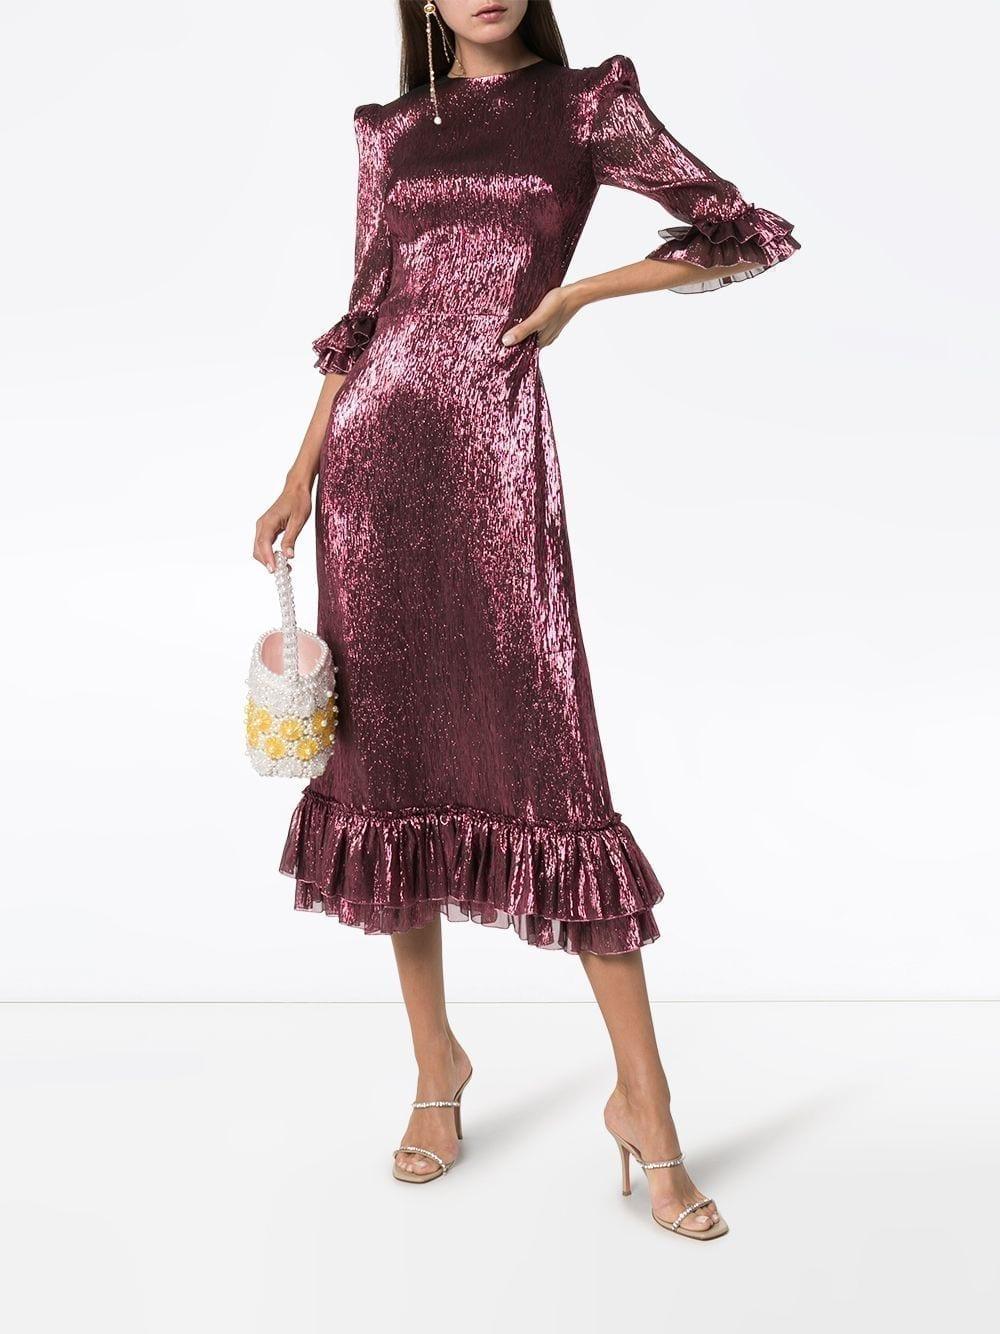 THE VAMPIRE'S WIFE Falconetti Ruffle Trim Dress